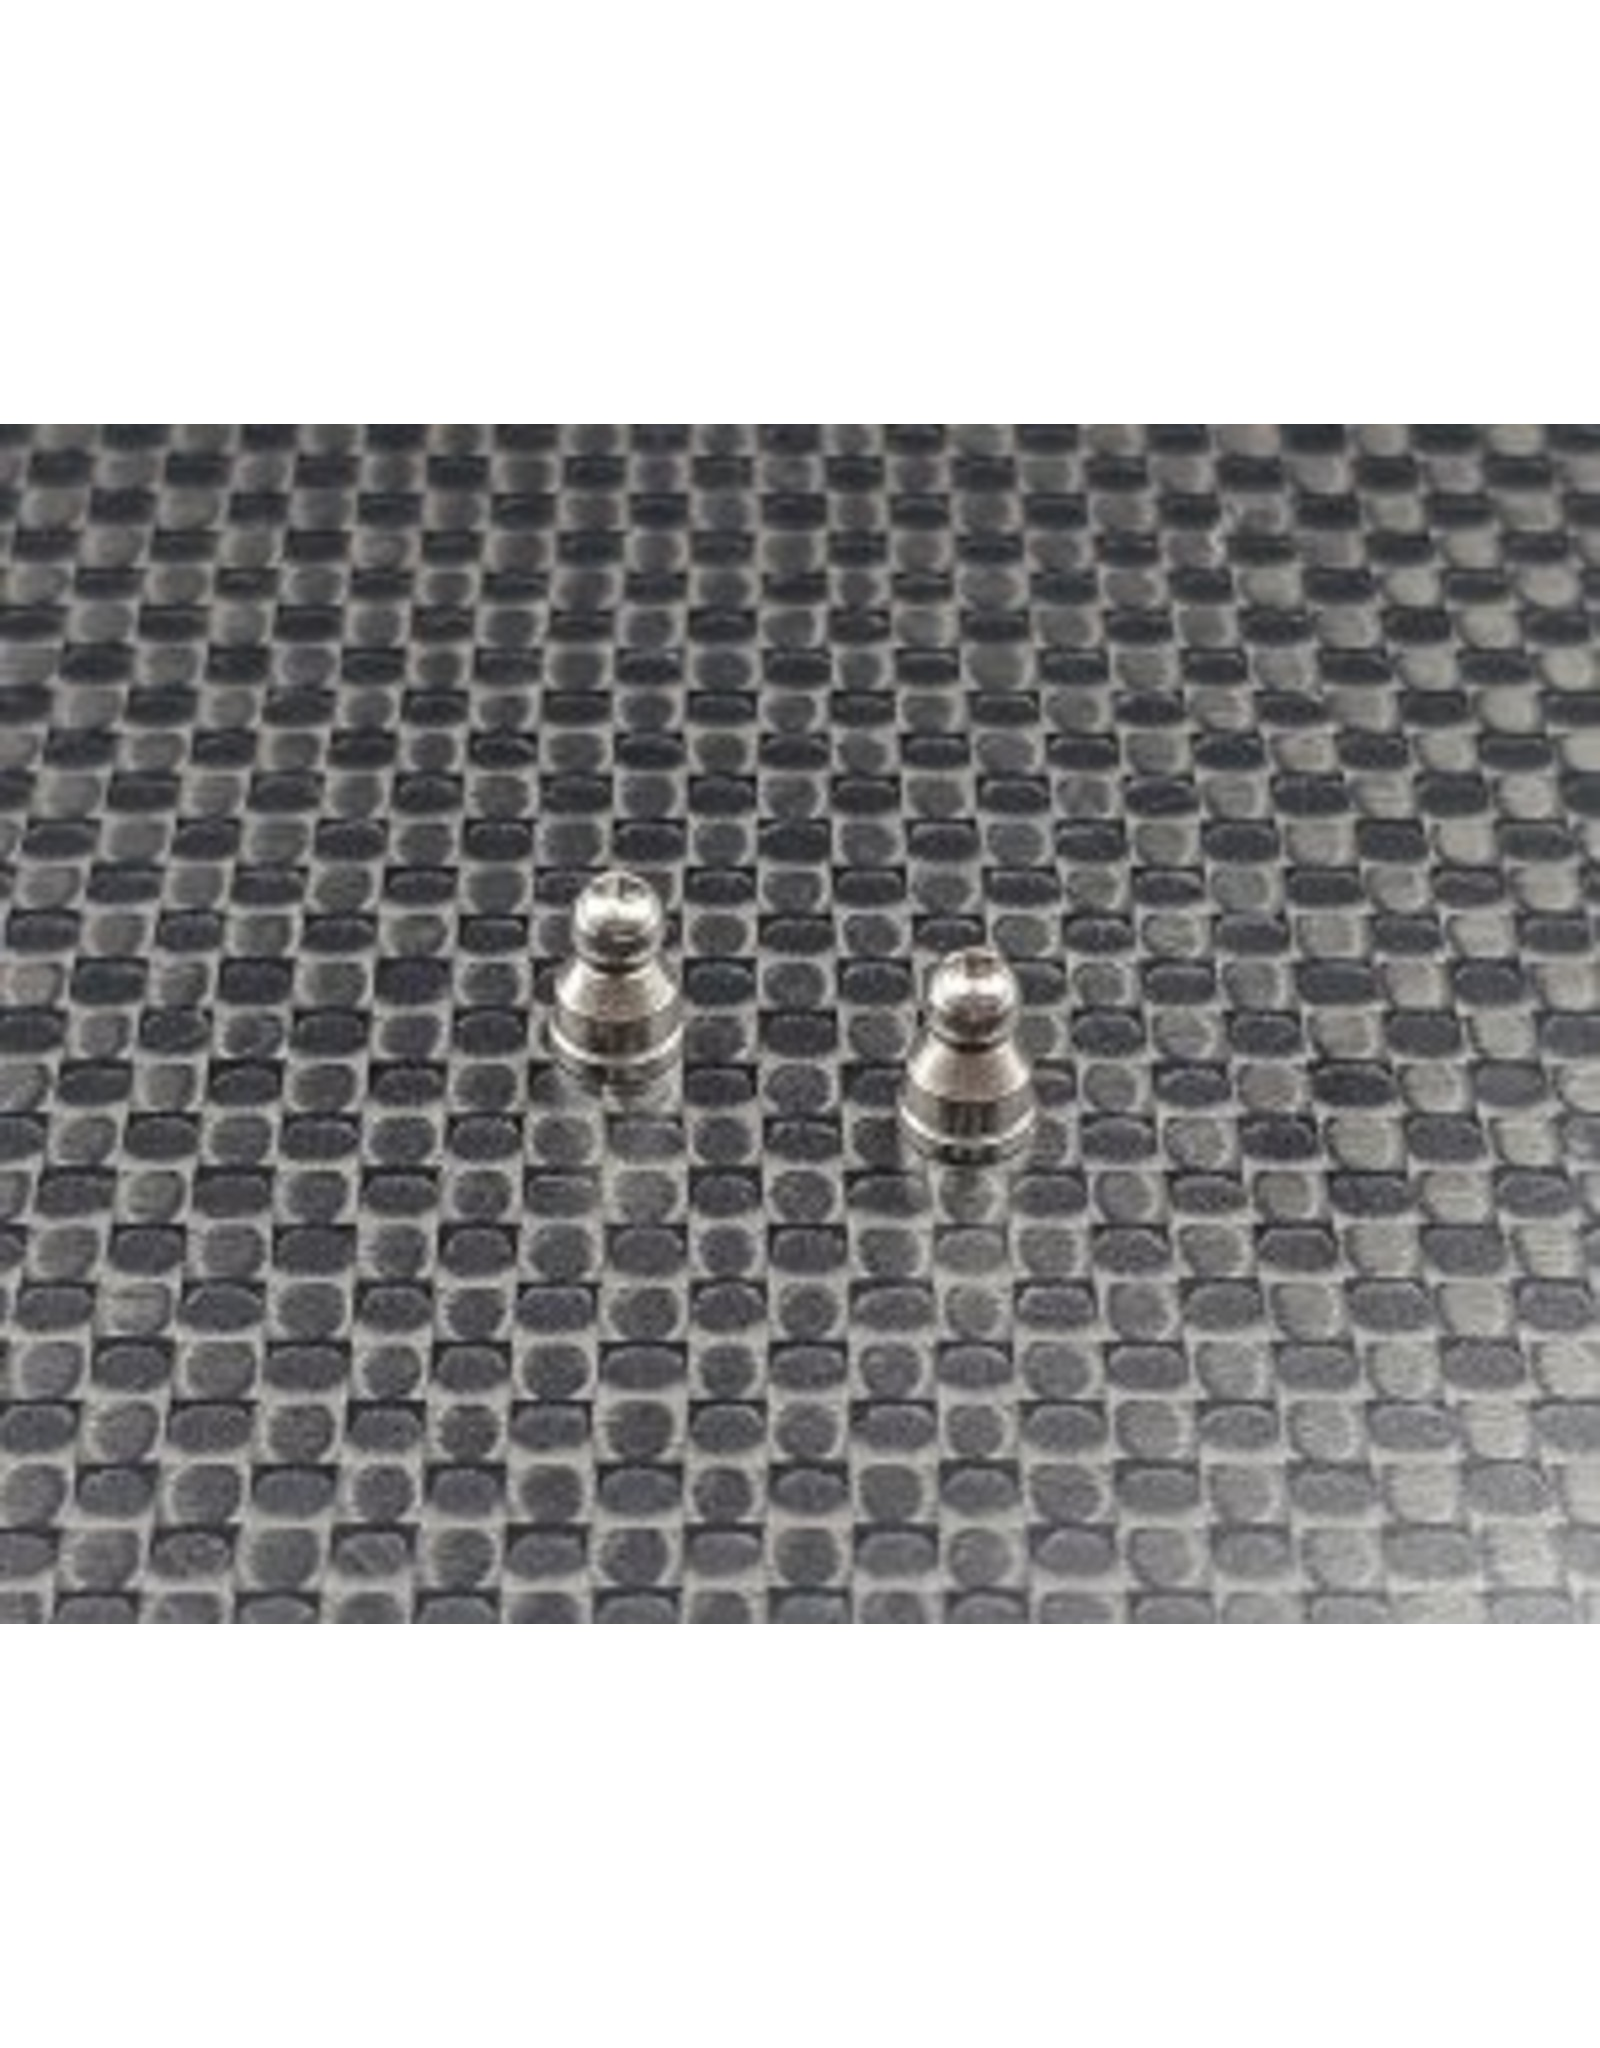 GL Racing GLA Knuckle Ball Joint Head 2.5mm (2pcs)(GLA-S010)